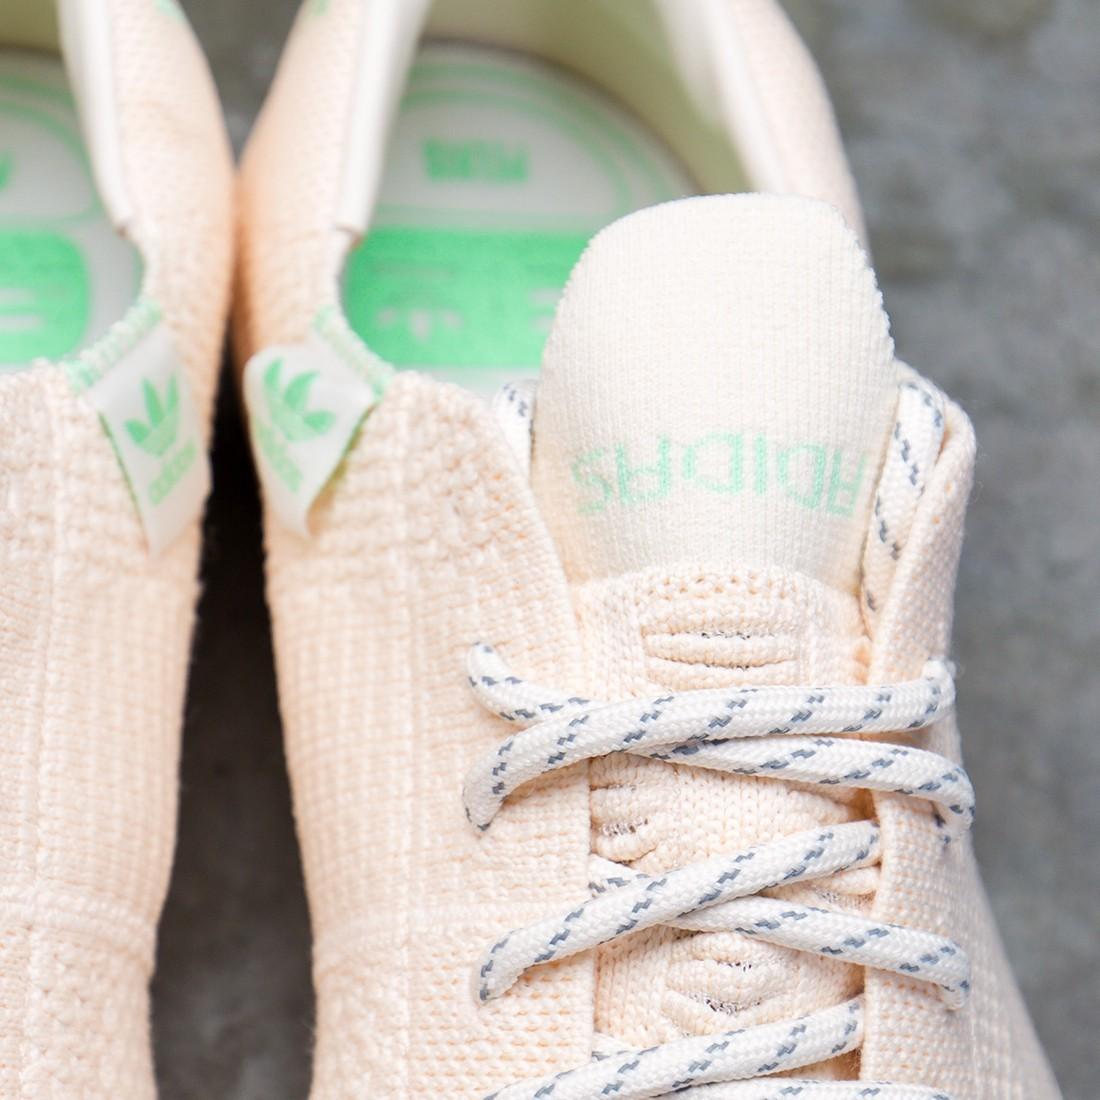 Adidas x Pharrell Williams Men Superstar Primeknit (beige / ecru tint / cream white / glow mint)